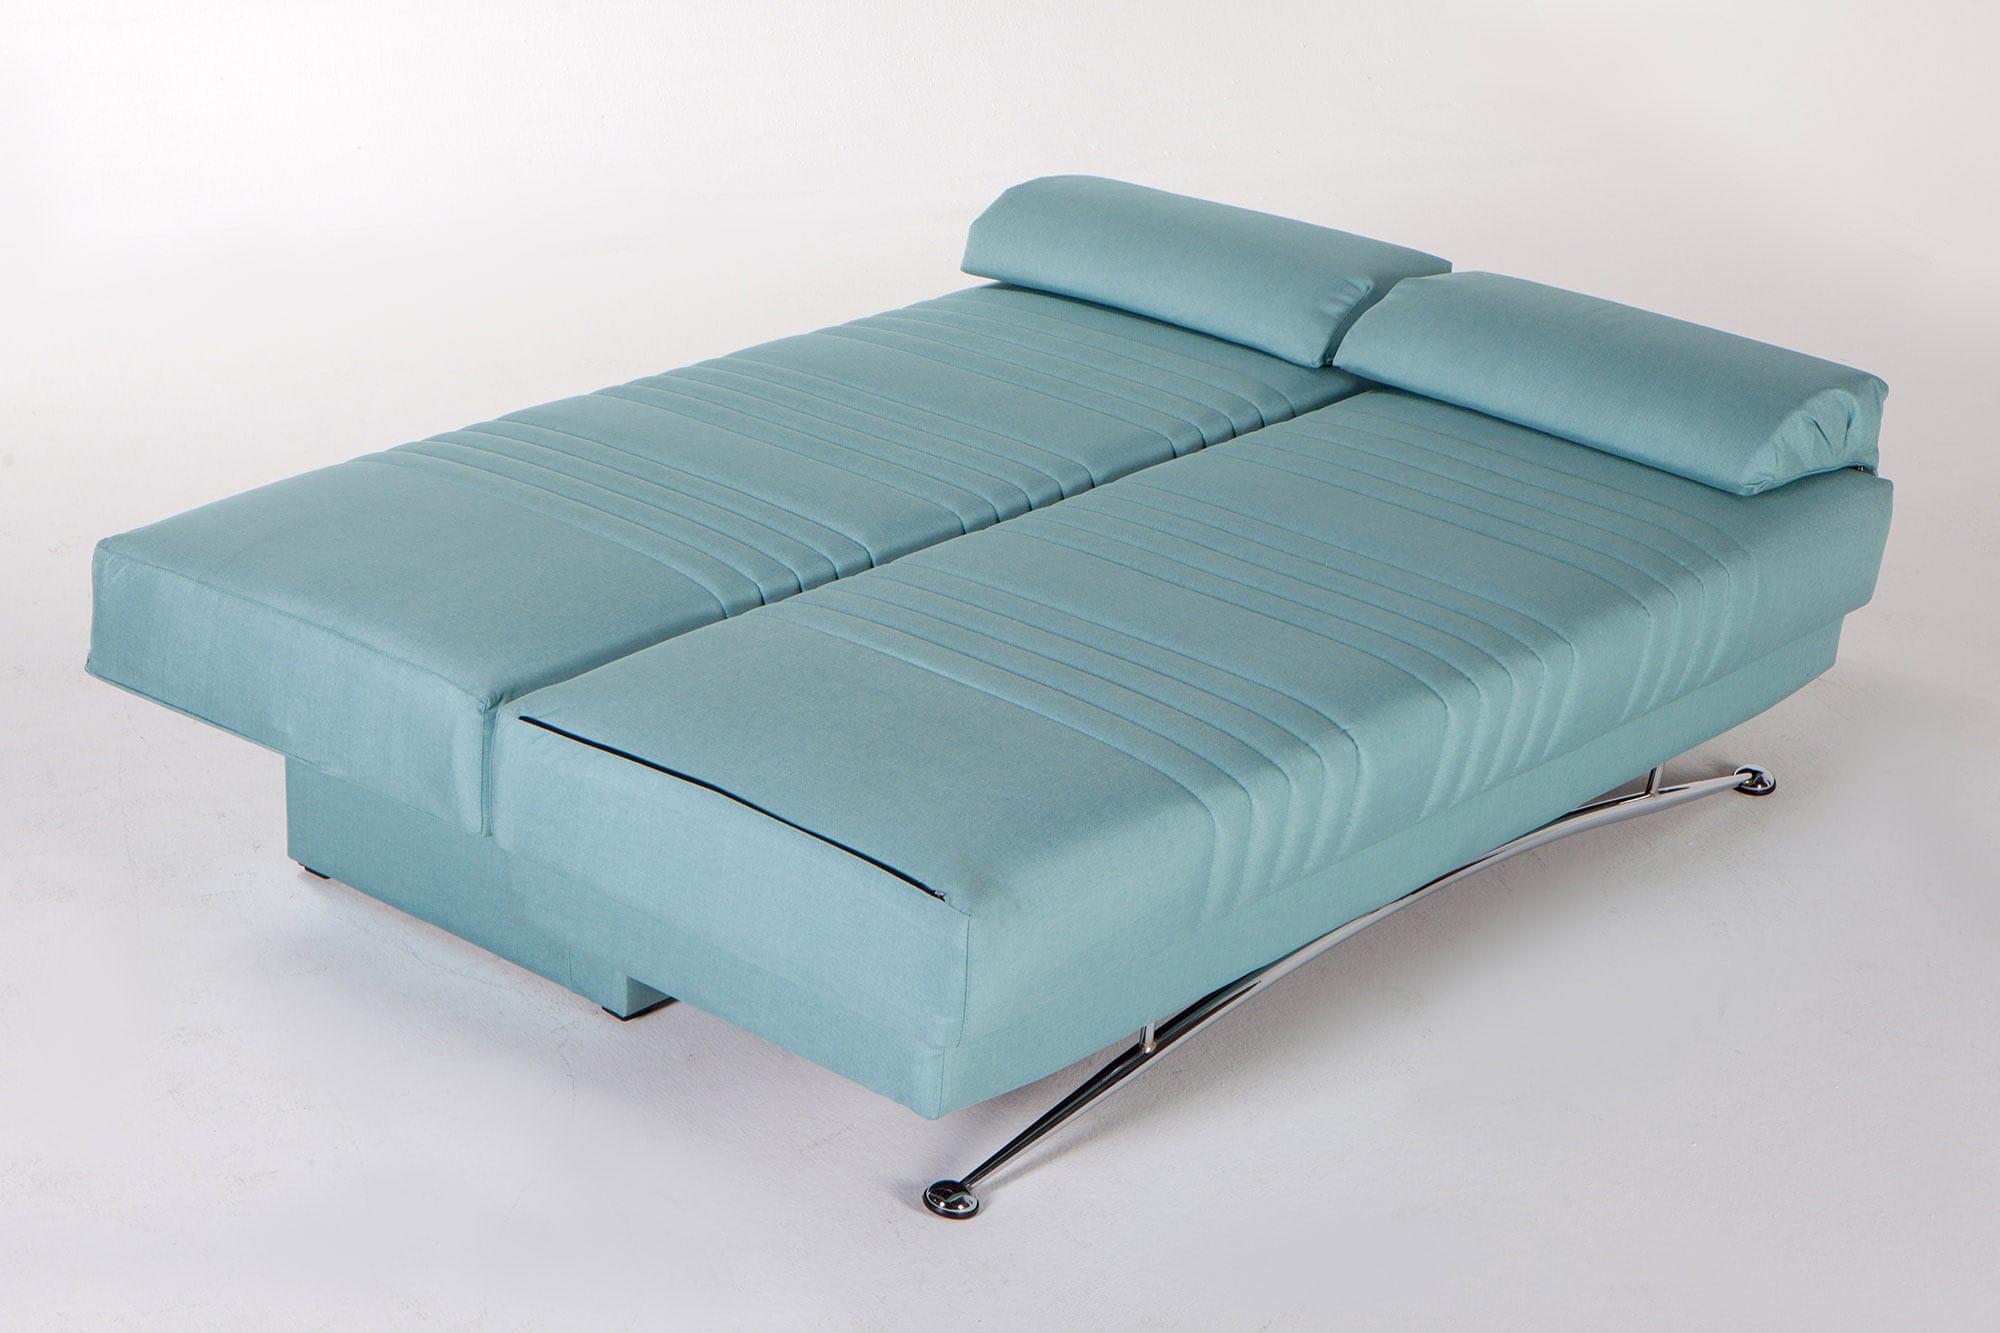 Pleasant Fantasy Coton Seafoam Green Convertible Sofa Bed By Istikbal Cjindustries Chair Design For Home Cjindustriesco